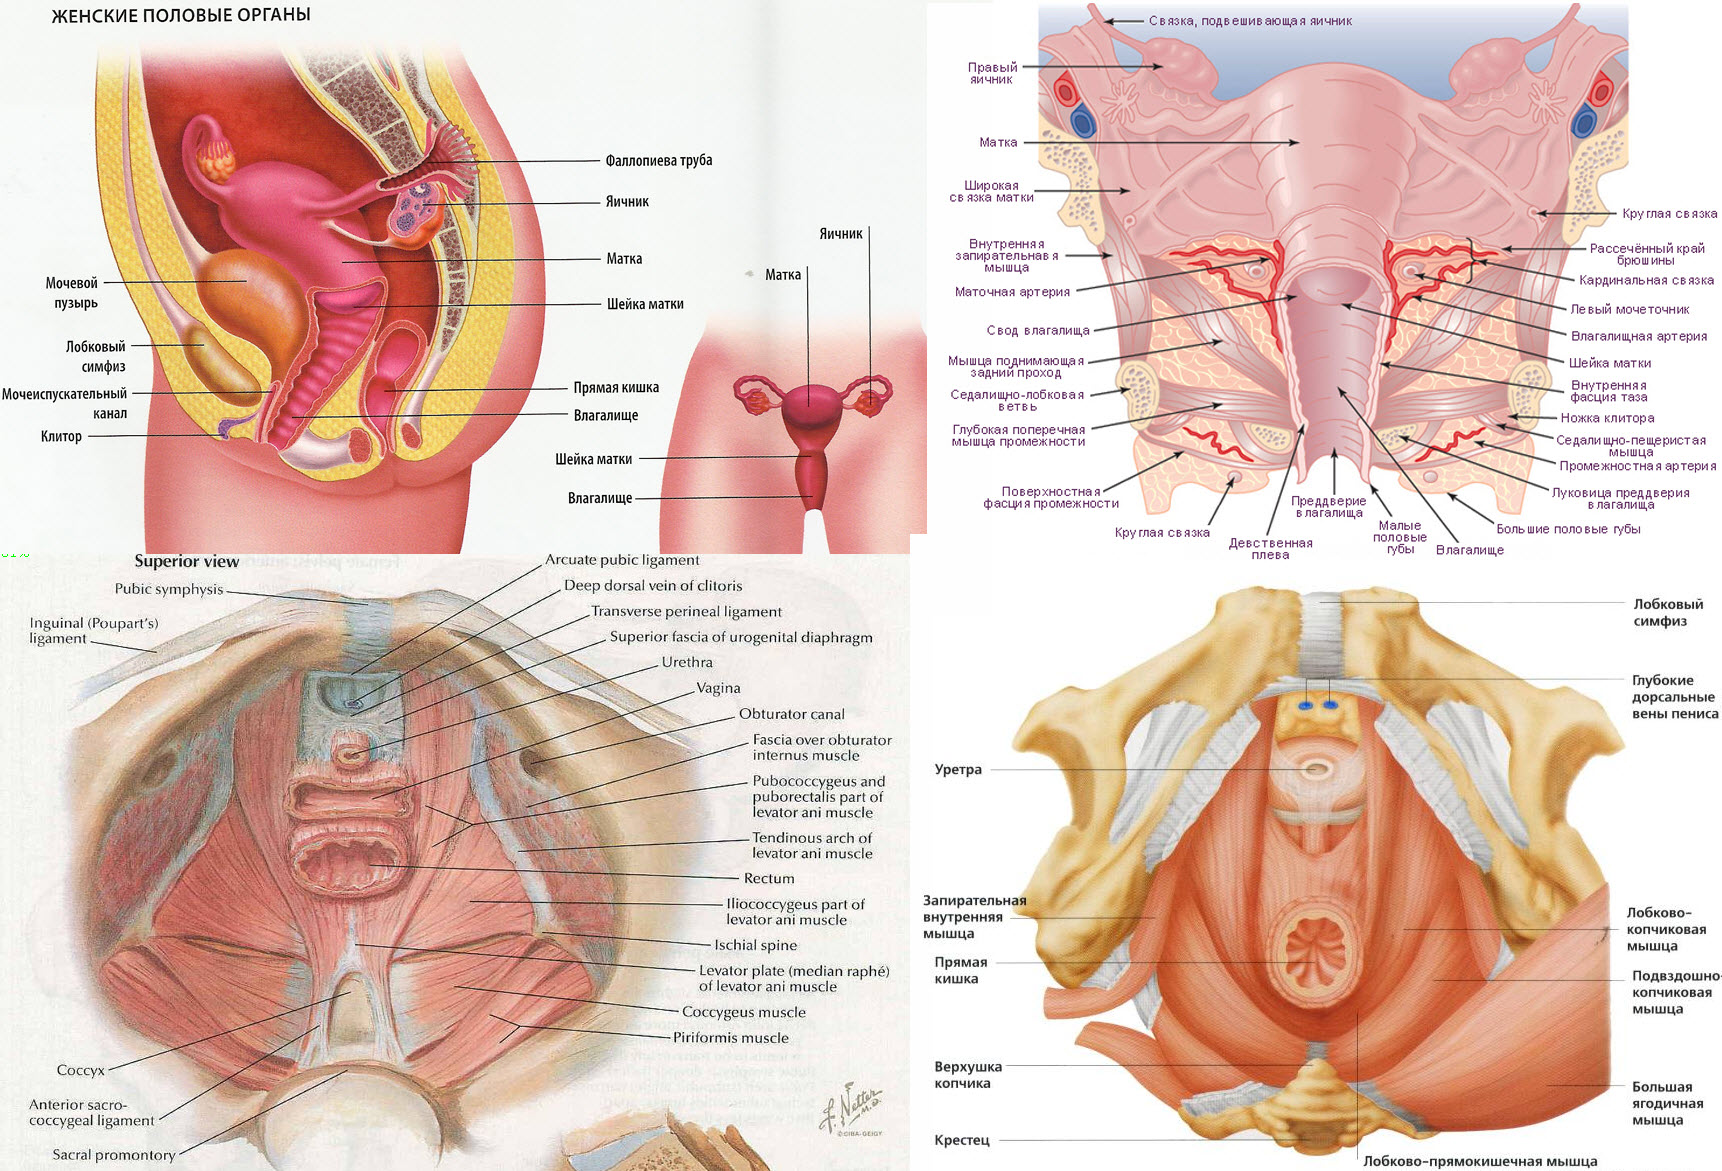 Мышцы тазового дна. Анатомия